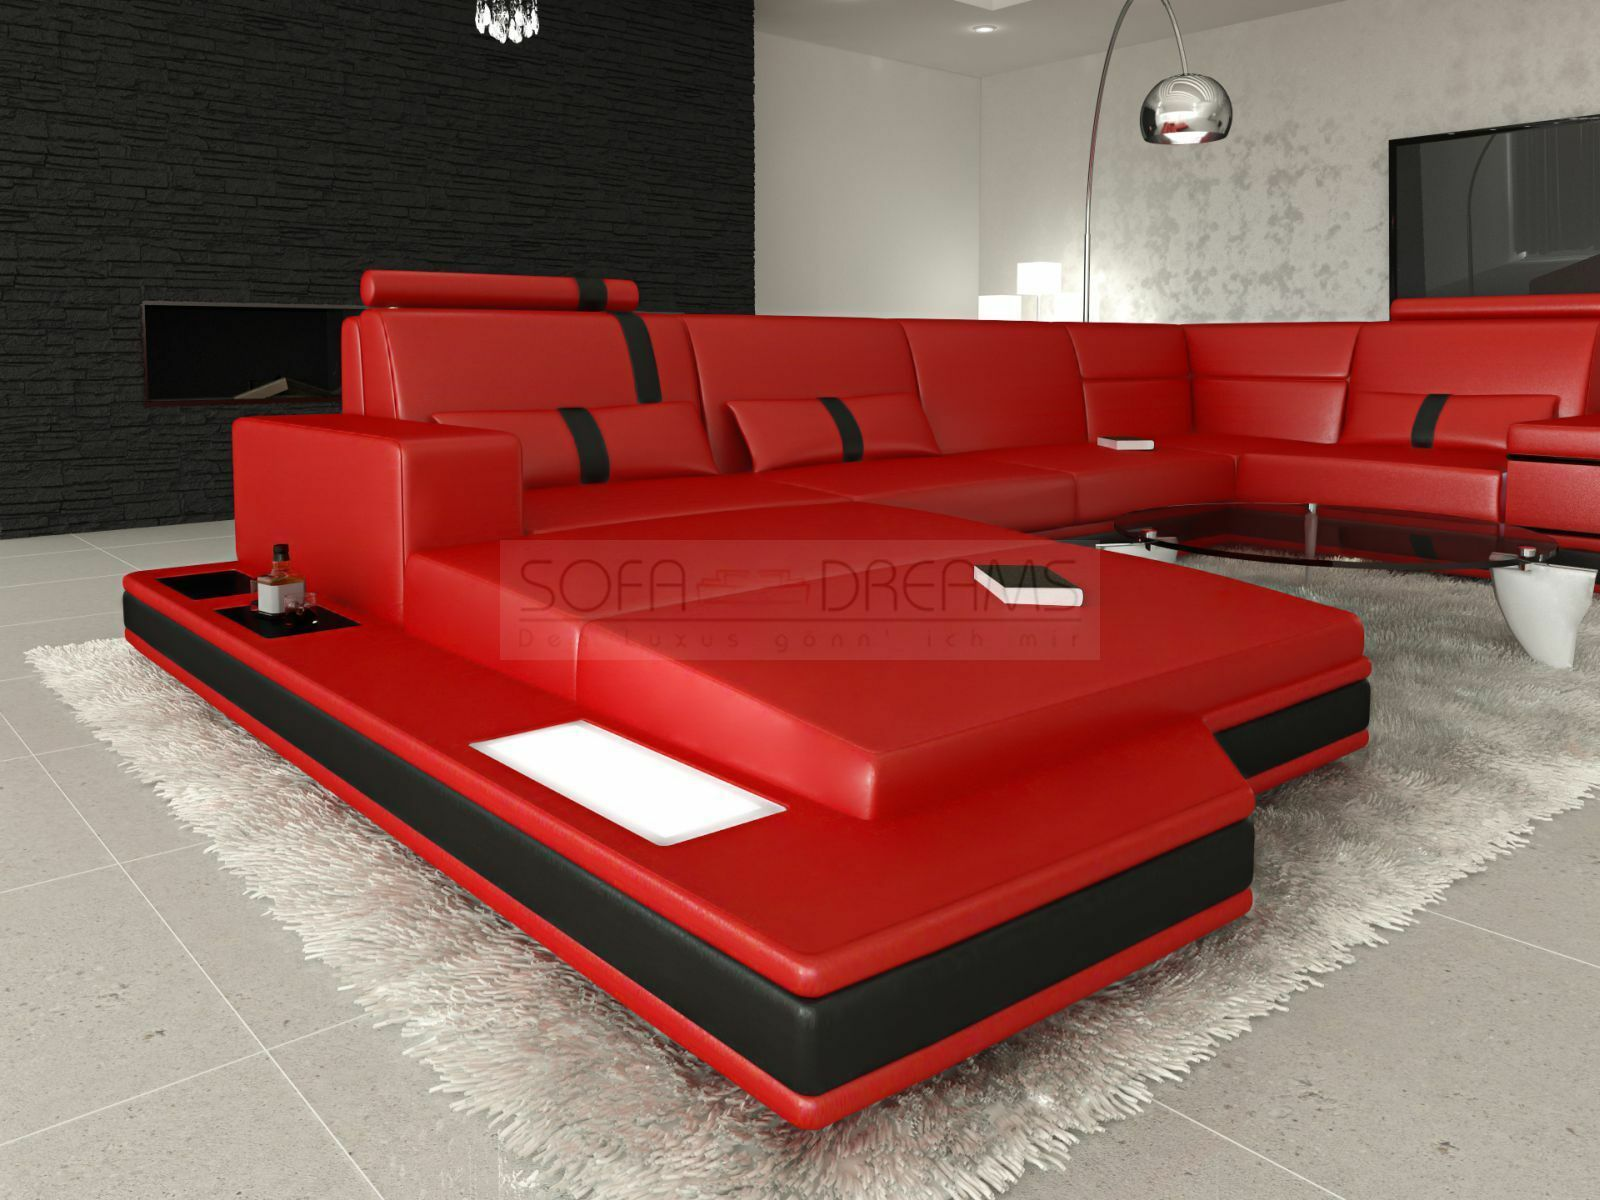 Ledersofa messana designer sofa wohnlandschaft licht eur for Designer wohnlandschaft